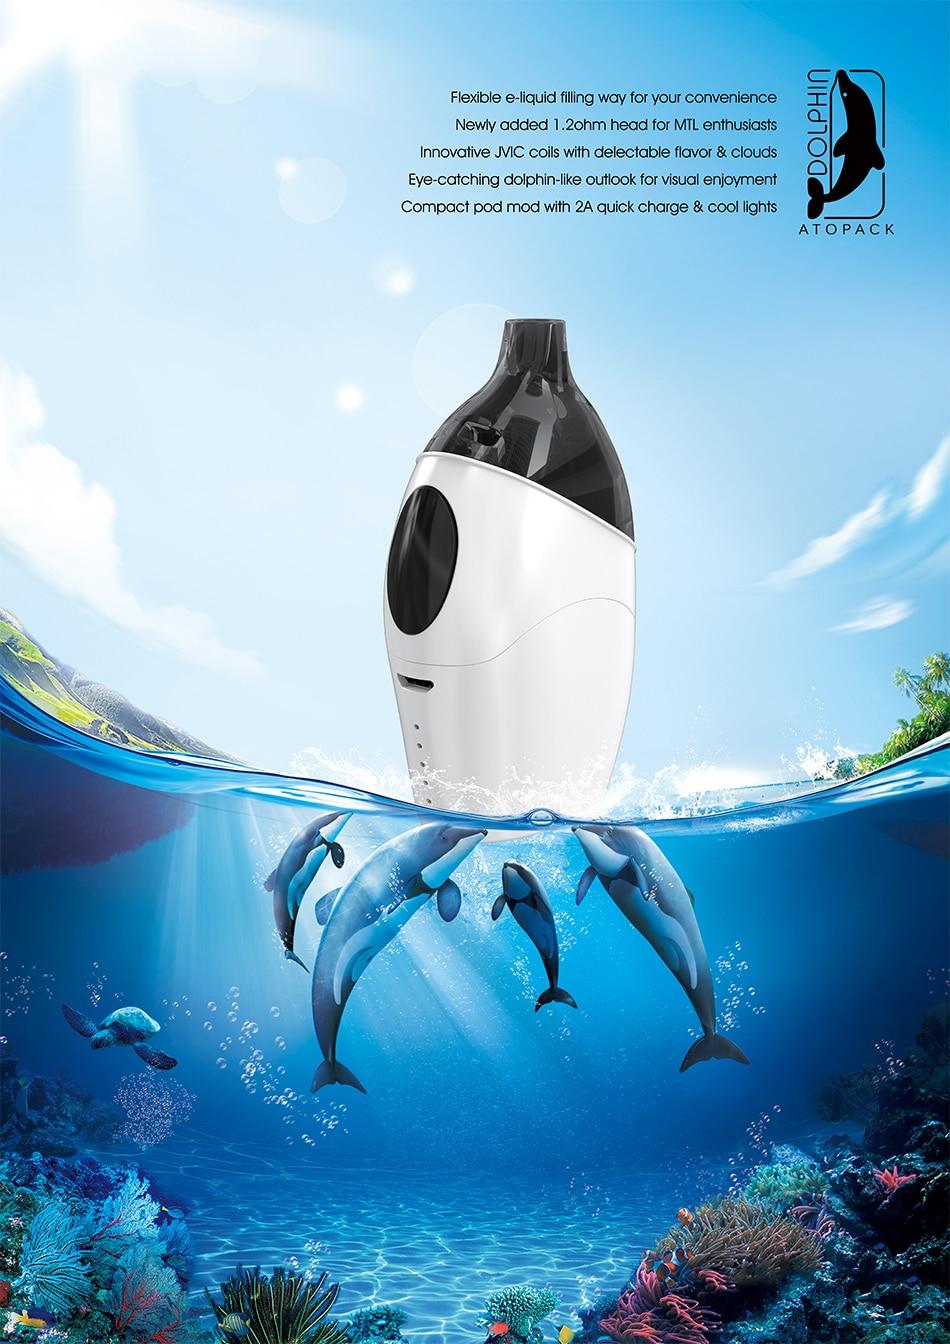 Joyetech Atopack Dolphin vape Kit